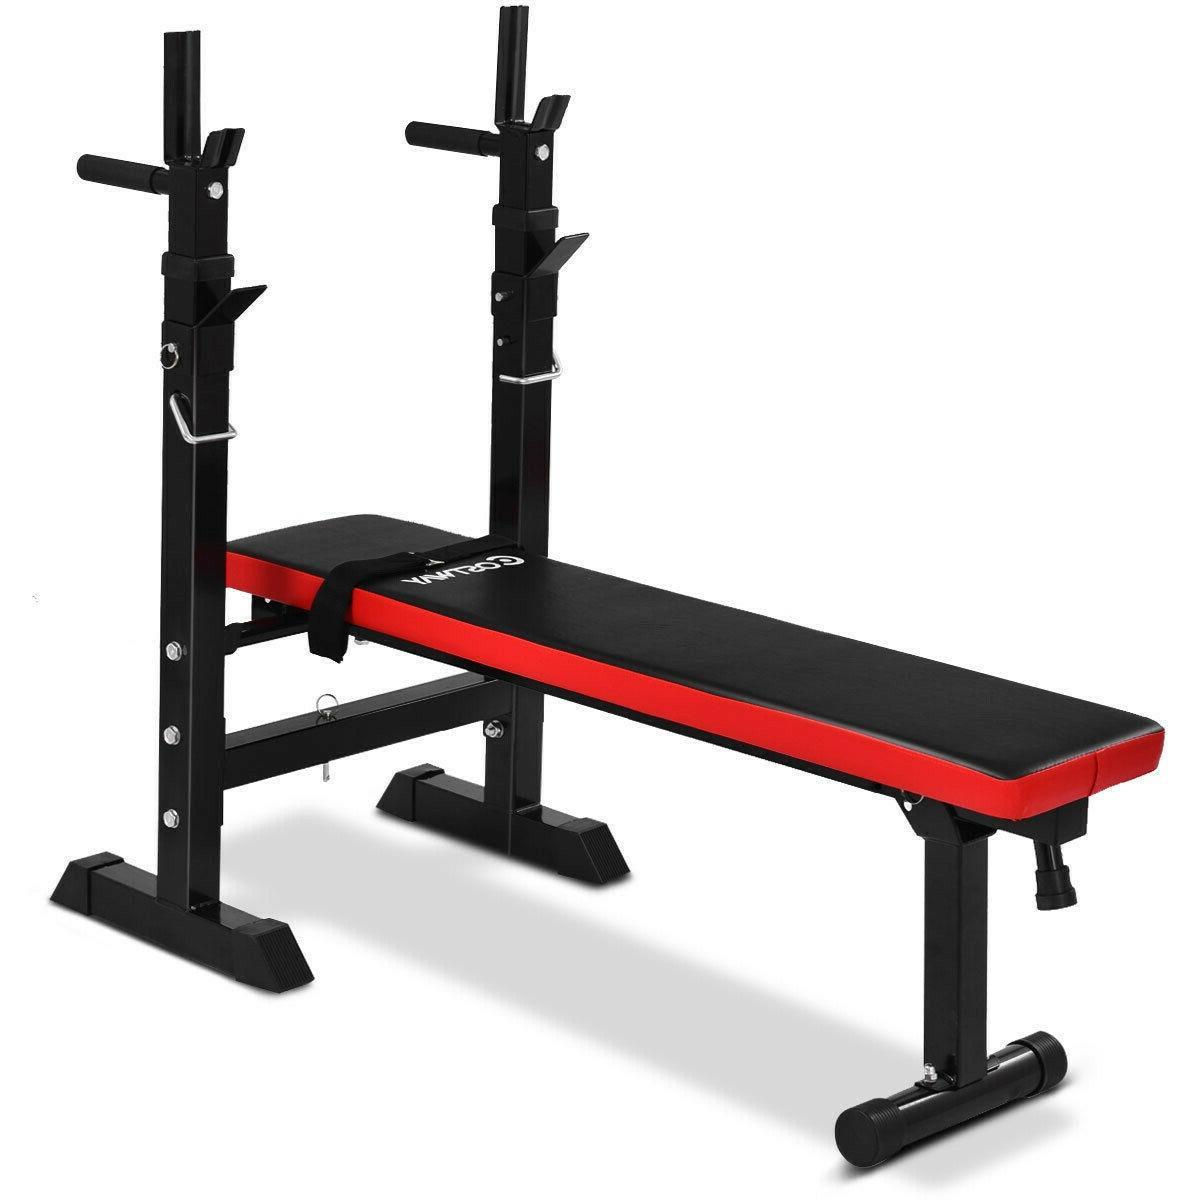 Adjustable Folding Lifting Flat Fitness Workout